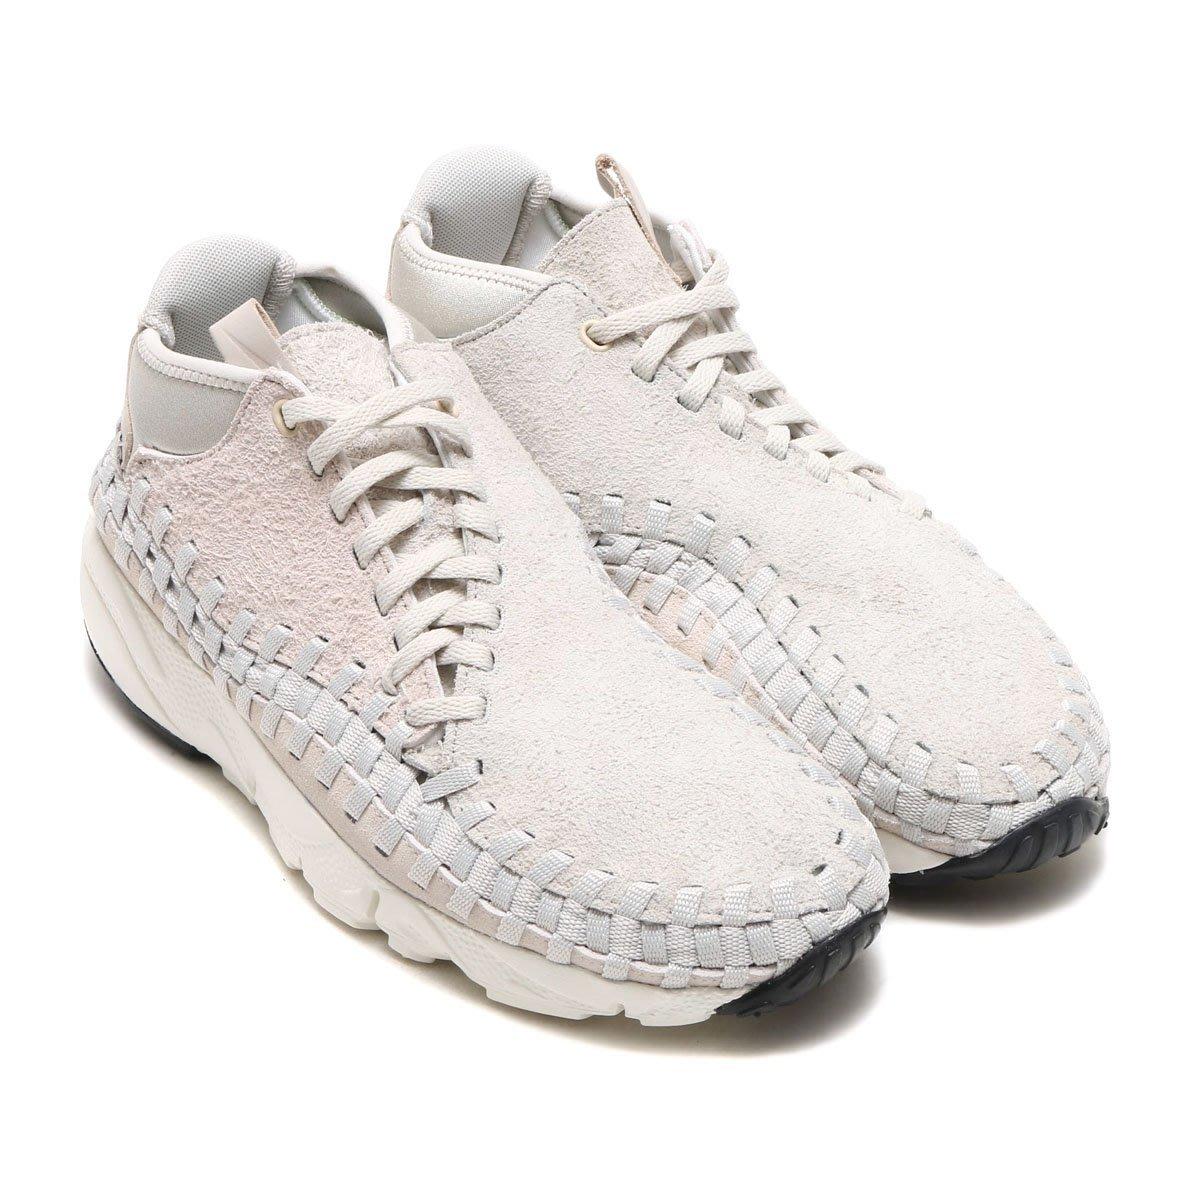 promo code 855d7 fba4c  CodE  NIKE AIR FOOTSCAPE WOVEN CHUKKA QS 編織慢跑鞋(灰)913929-002   Yahoo奇摩拍賣